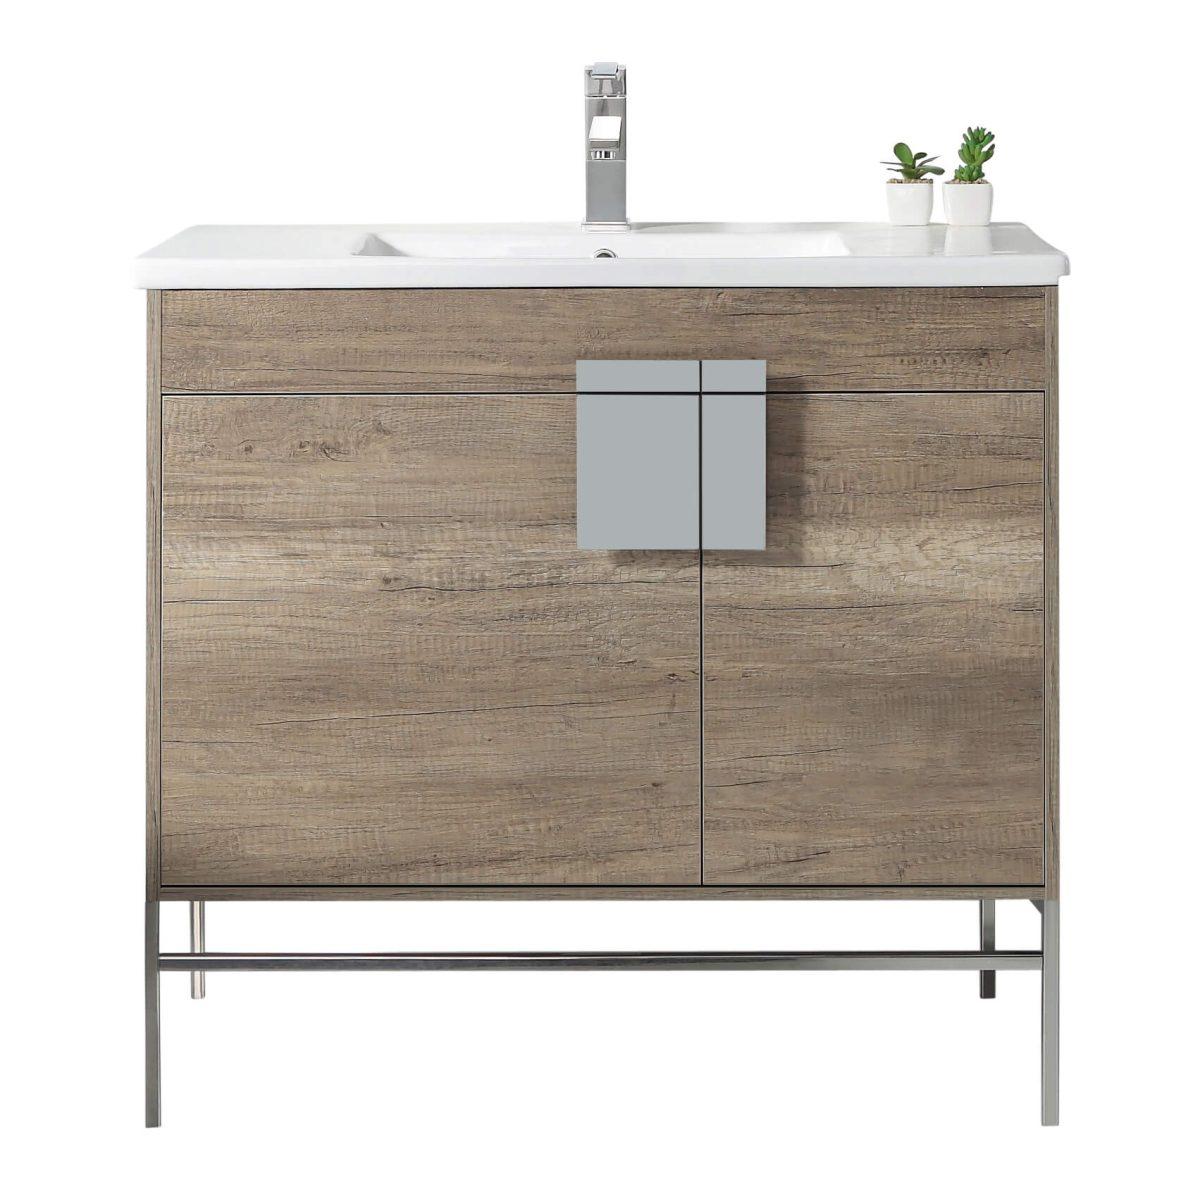 "Shawbridge 36"" Modern Bathroom Vanity  Shadow Gray with Polished Chrome Hardware"